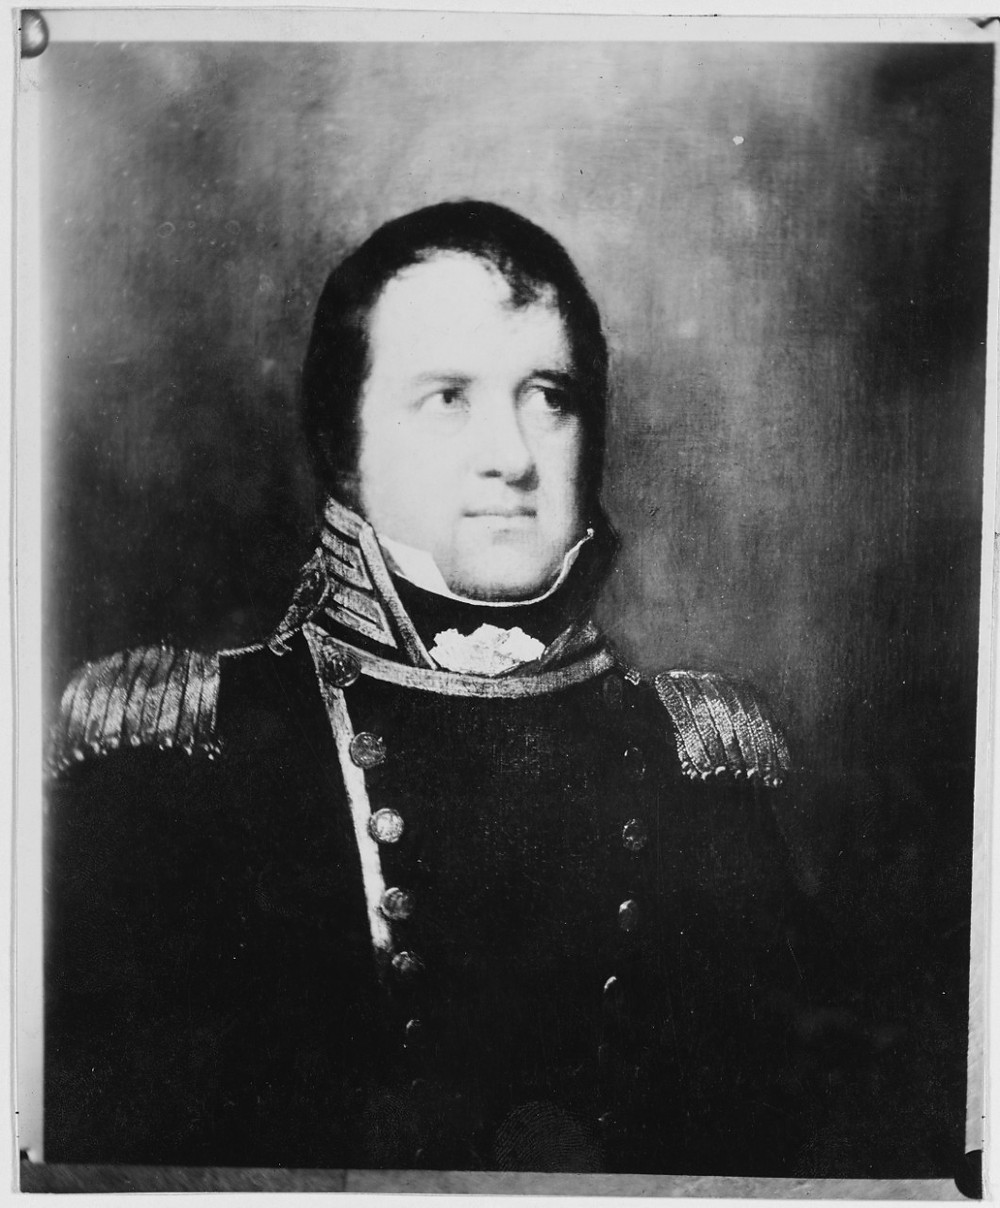 Captain Samuel Evans